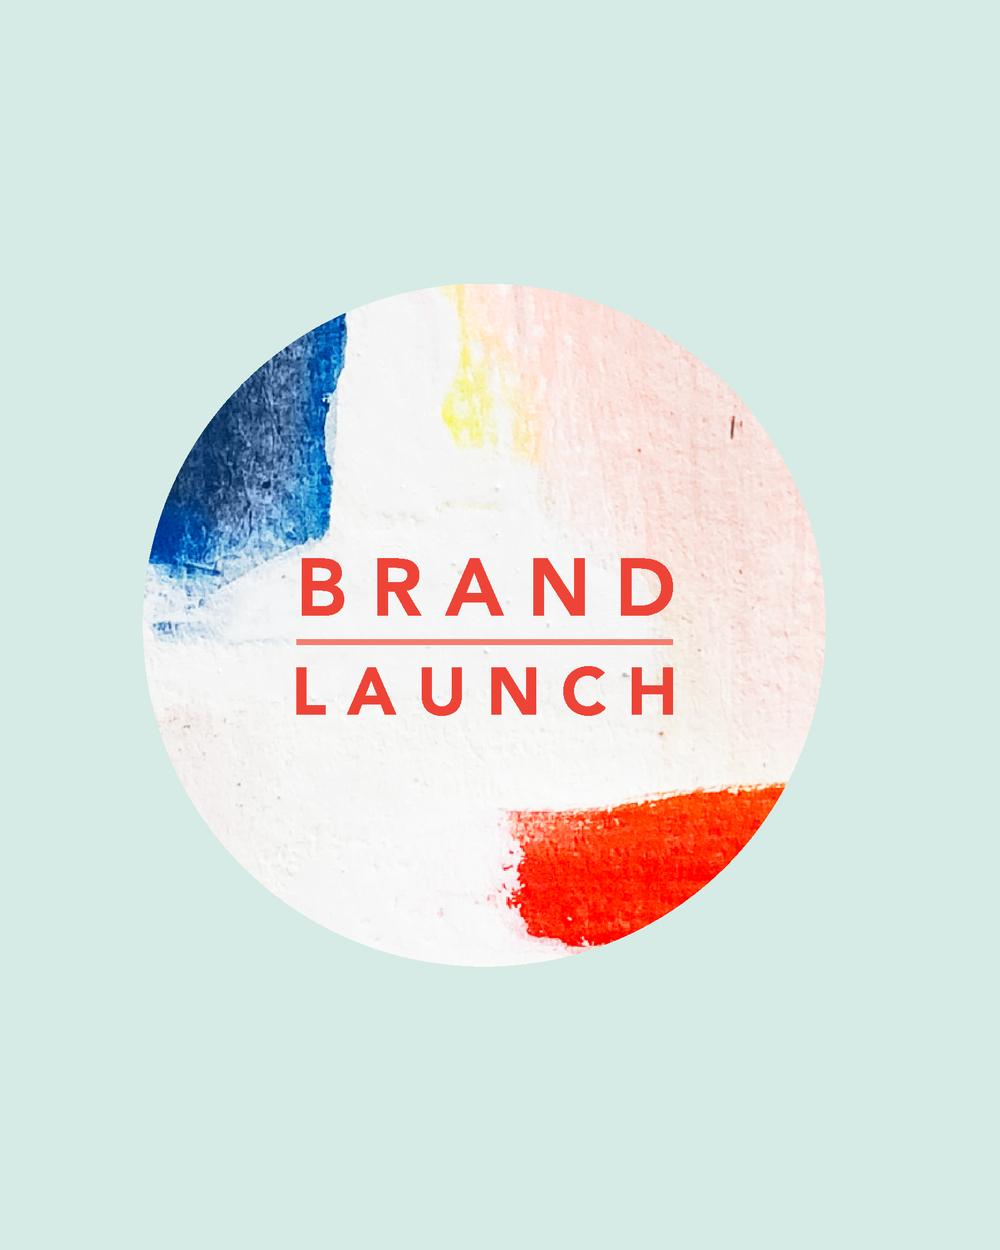 brandlaunch_icon.png